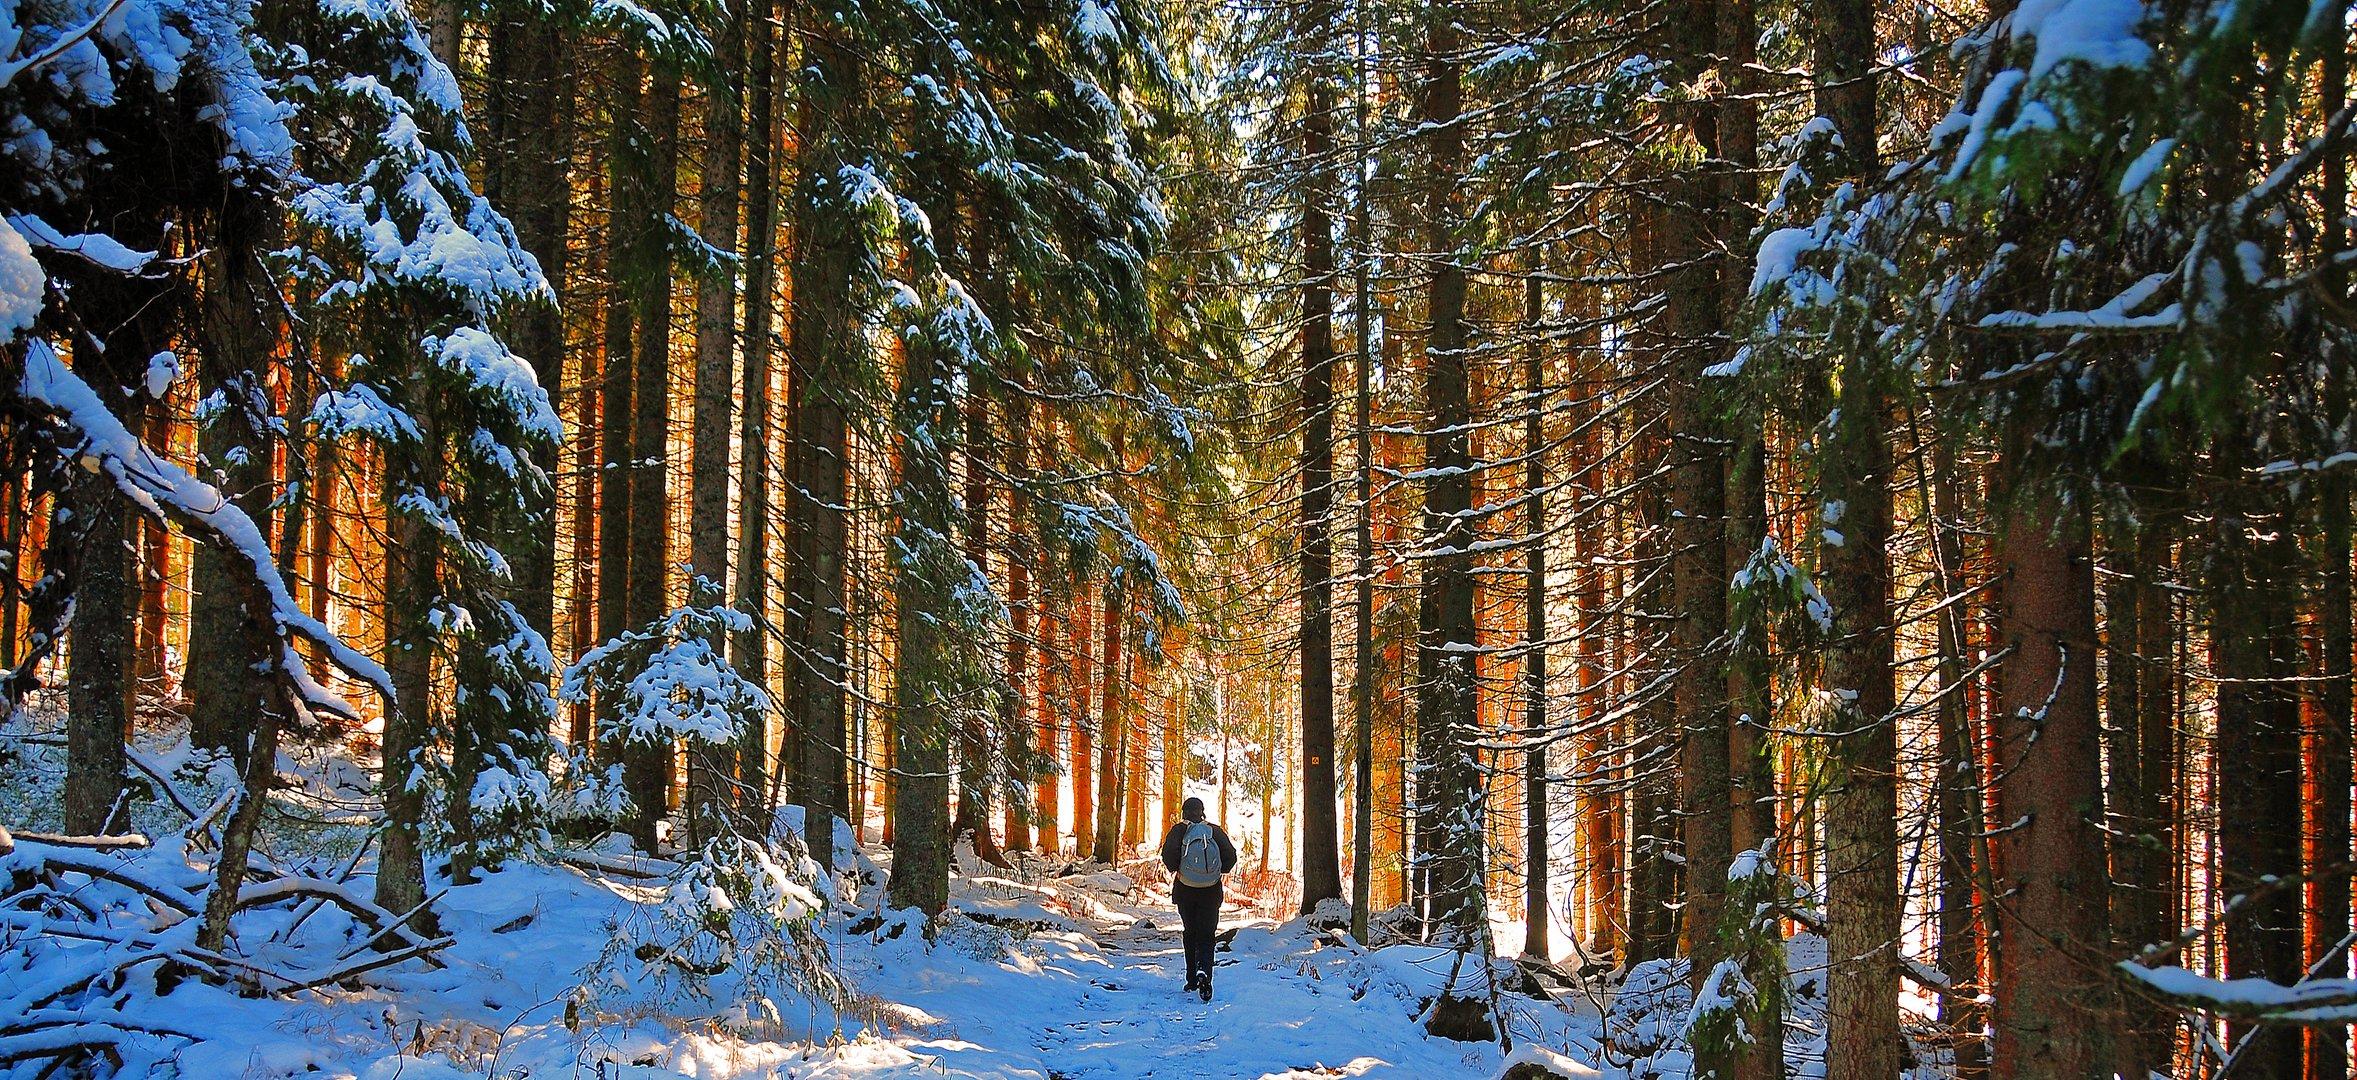 ... im Wald ....